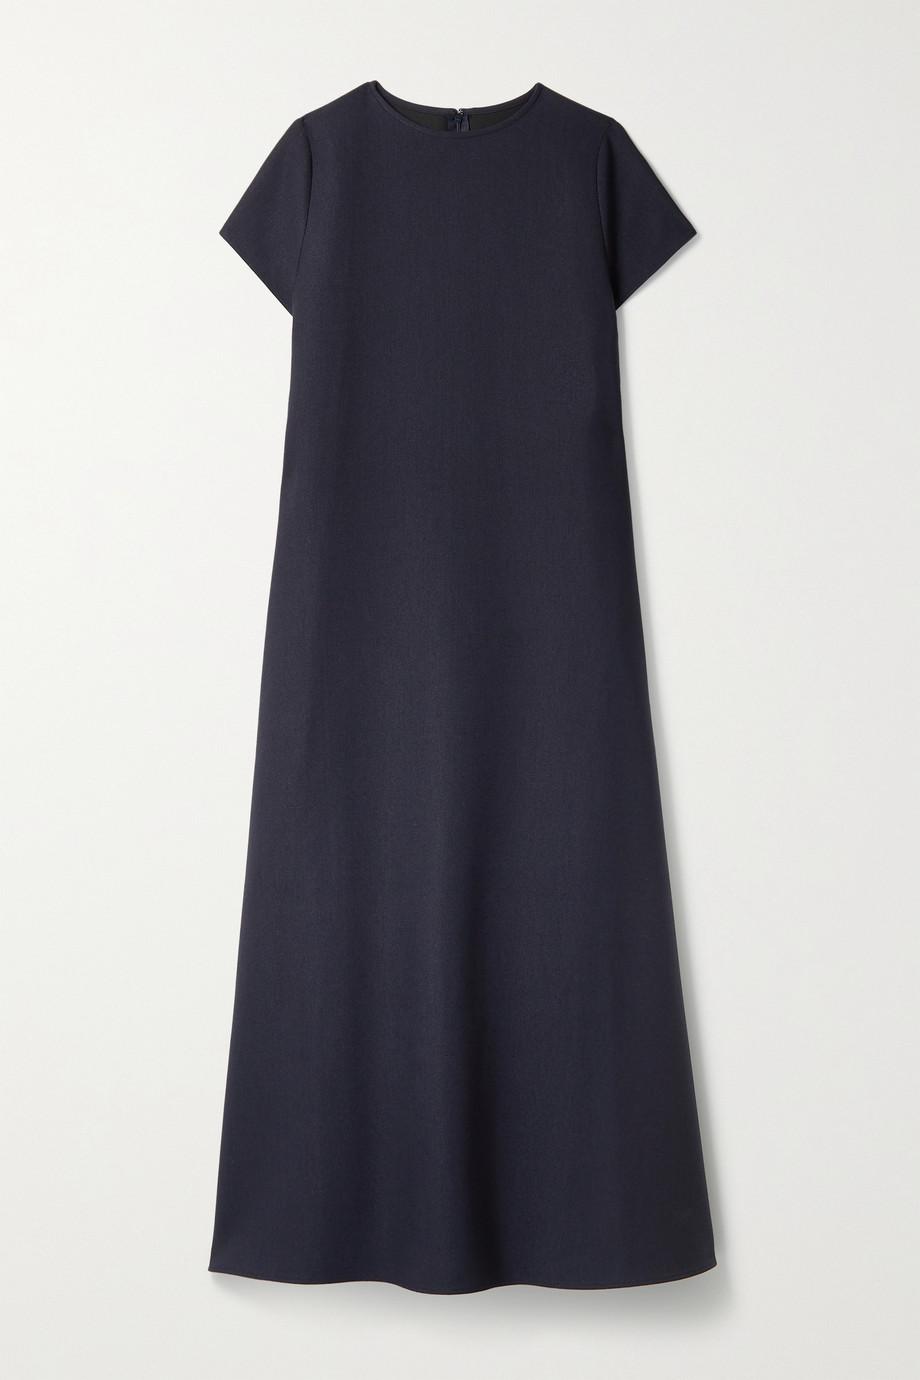 Frankie Shop Dakota grain de poudre maxi dress